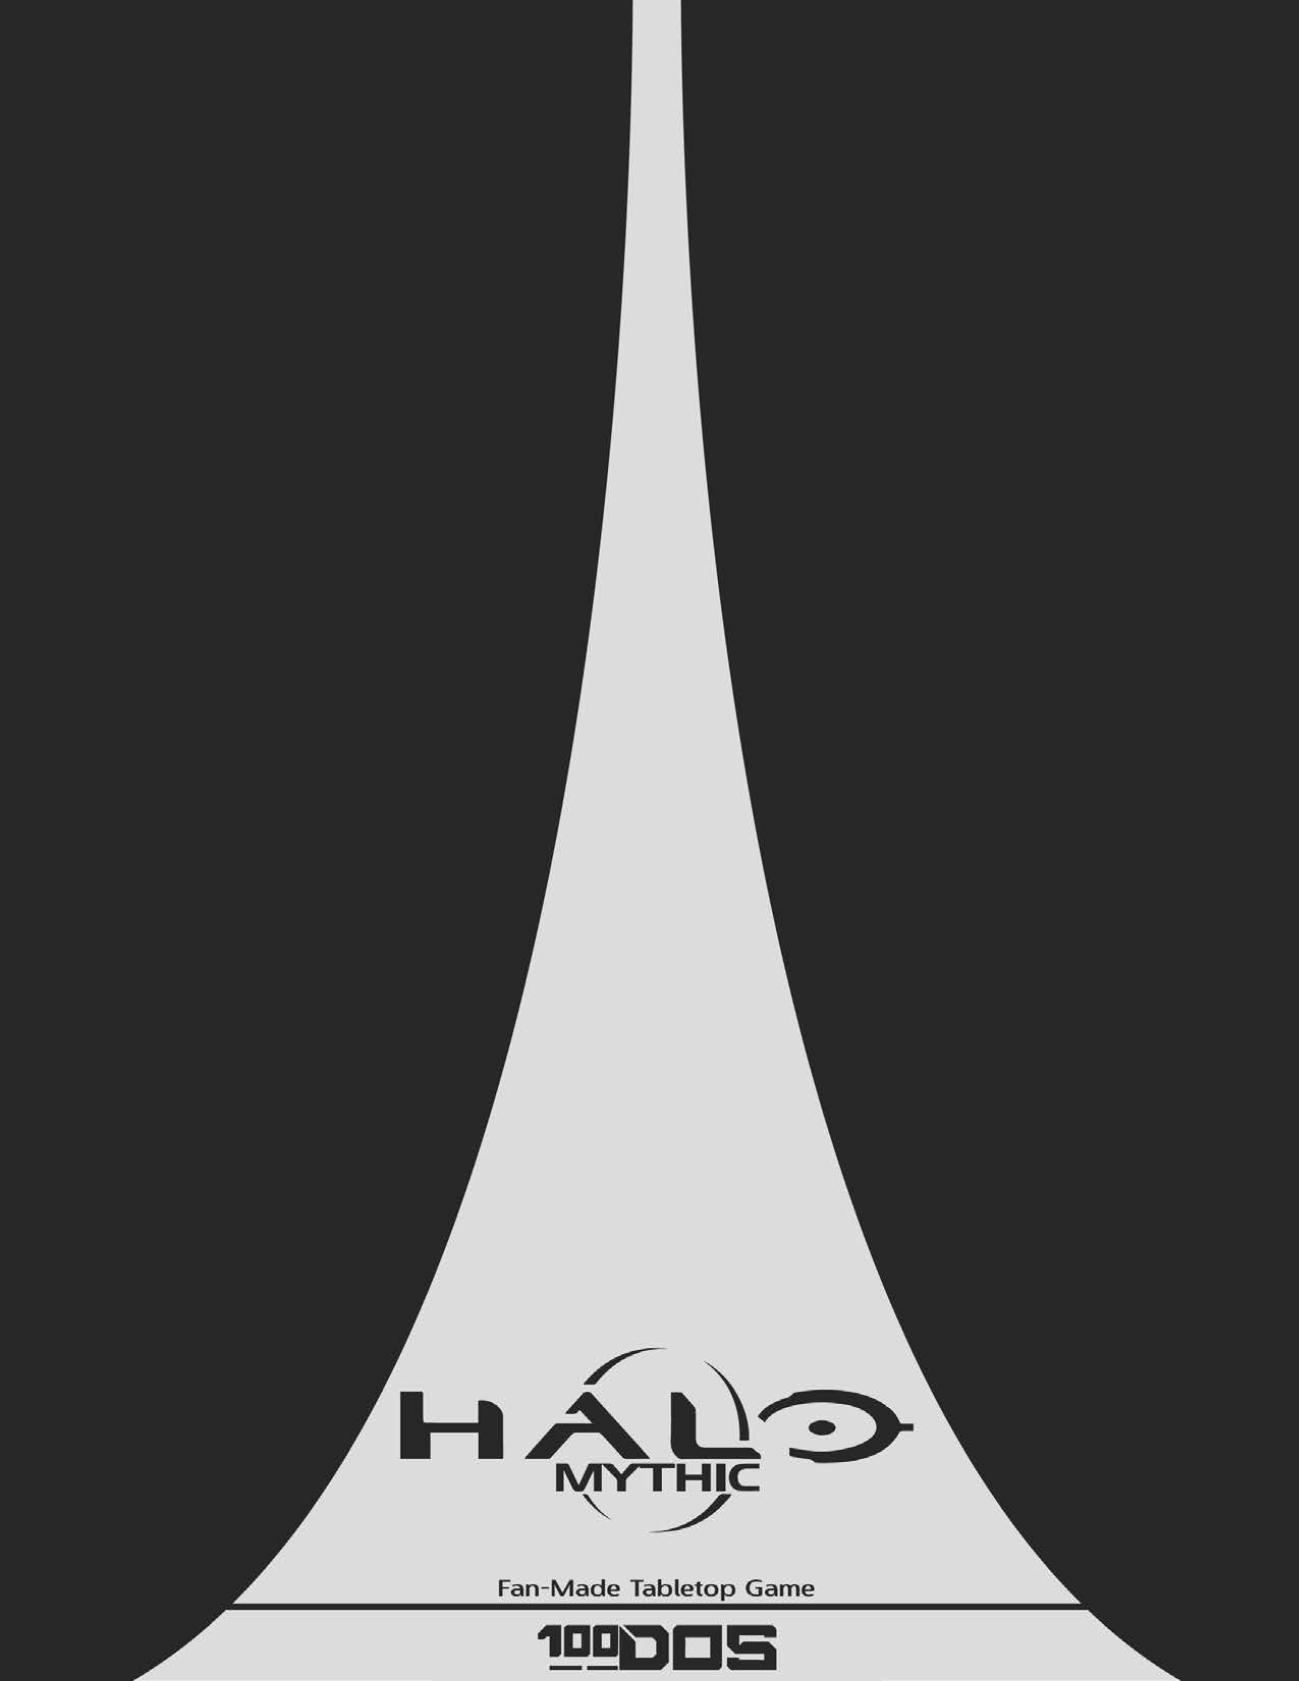 Halo mythic character sheet